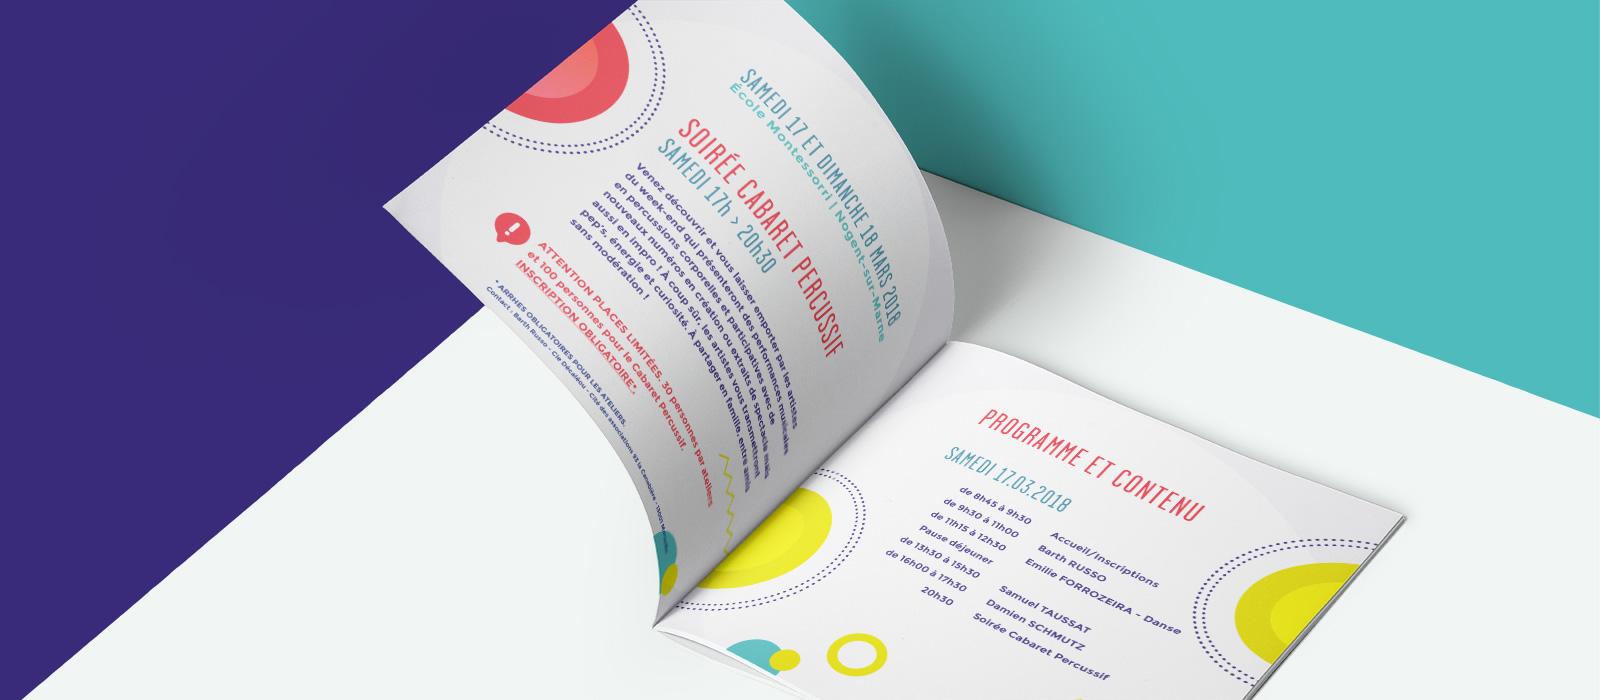 rencontres-musique-corporelle-brochure